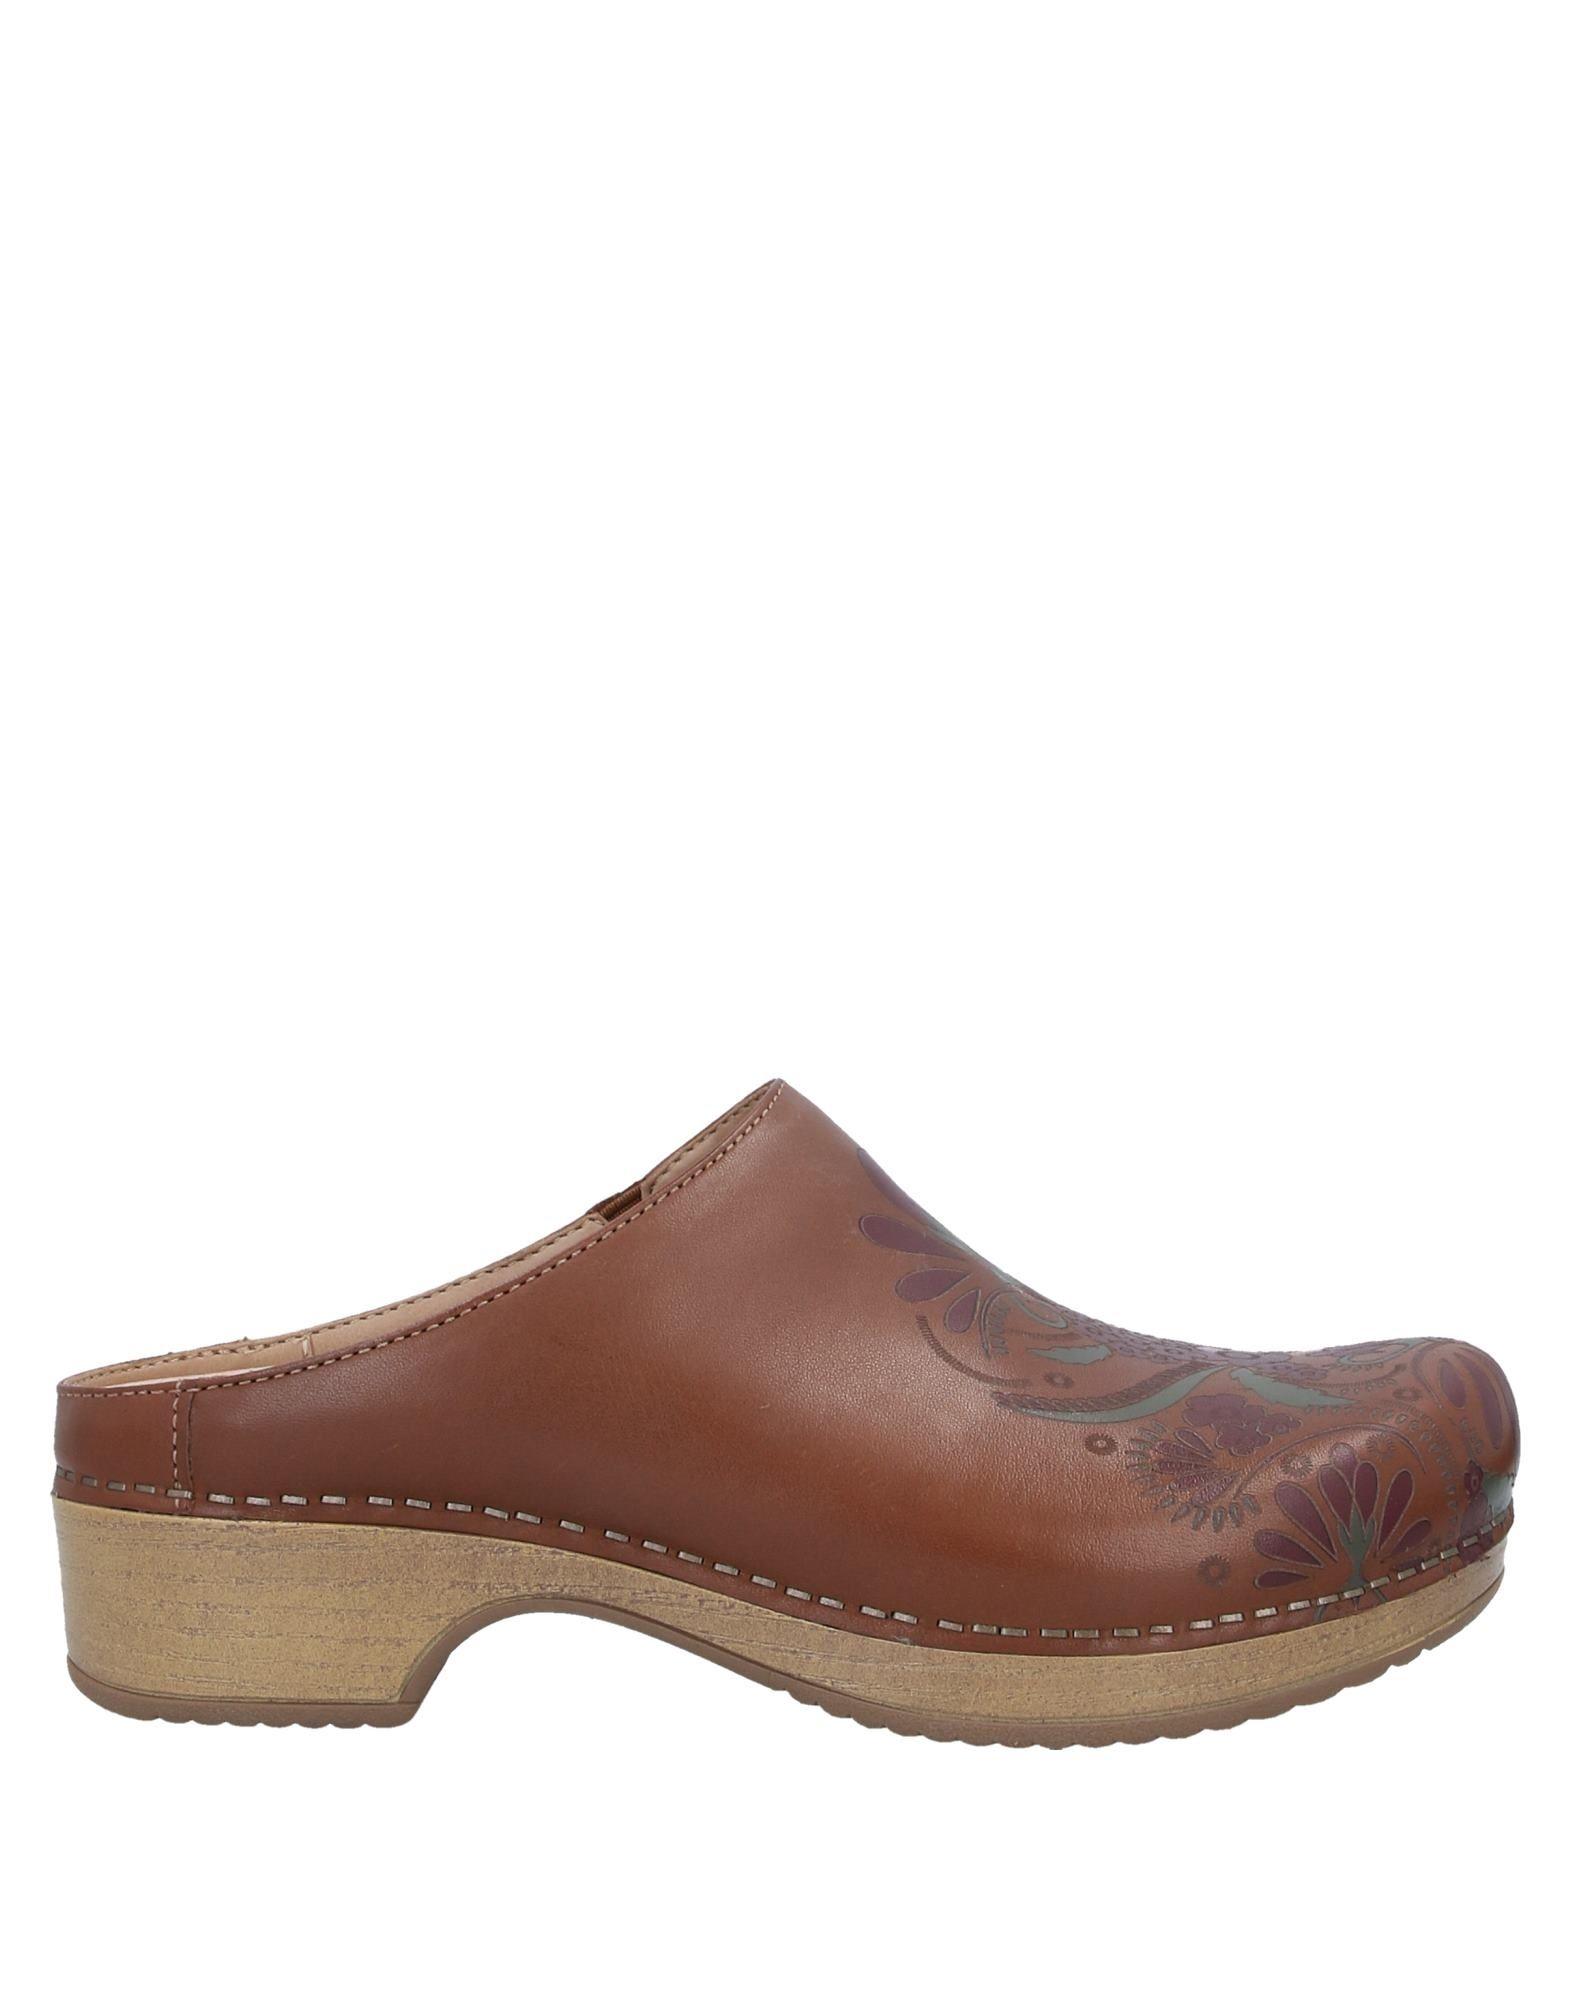 DANSKO Mules. leather, no appliqués, floral design, round toeline, stiletto heel, leather lining, rubber sole, contains non-textile parts of animal origin. Soft Leather